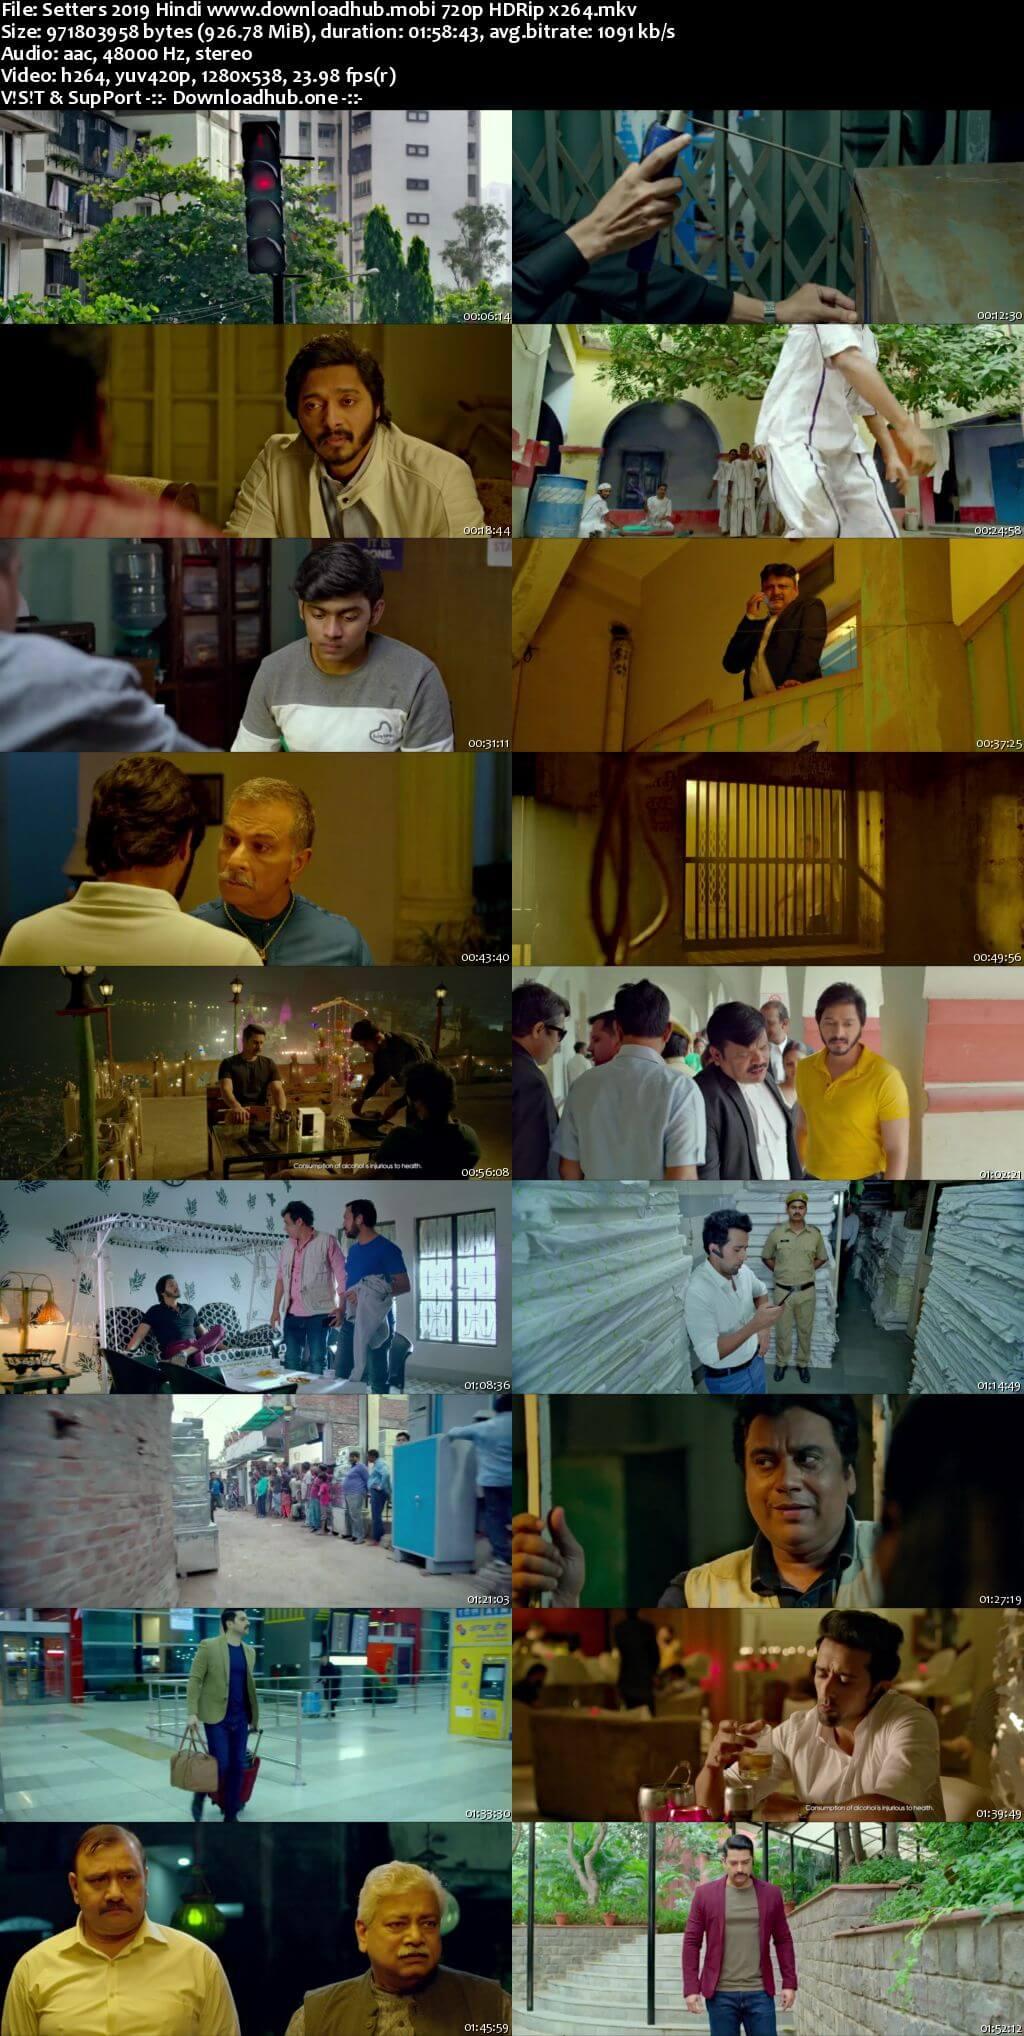 Setters 2019 Hindi 720p HDRip x264